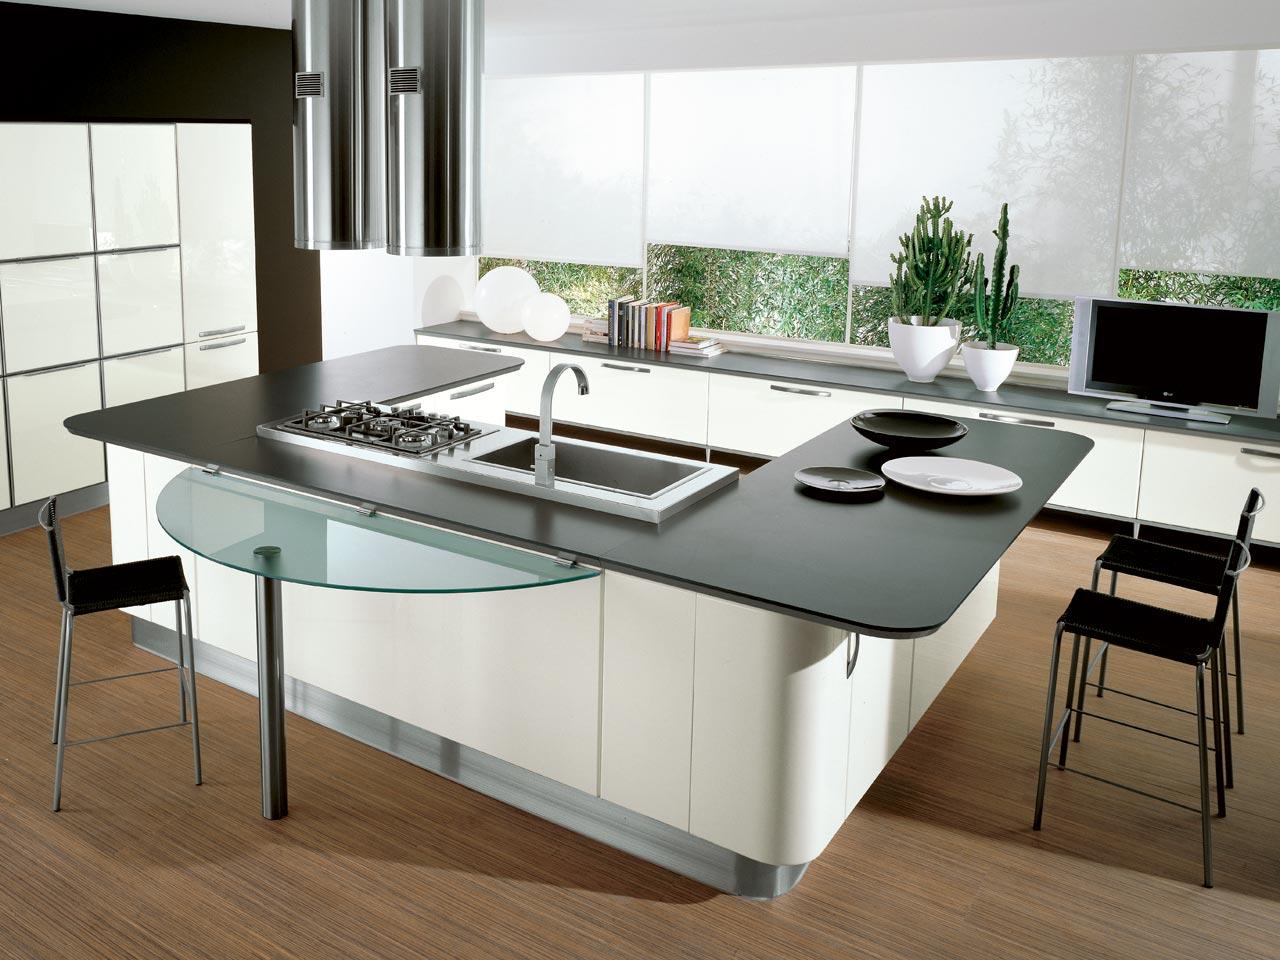 Reformas cocina integral qu prefieres cocinas con barra americana o isla central aqua - Cocinas de isla modernas ...